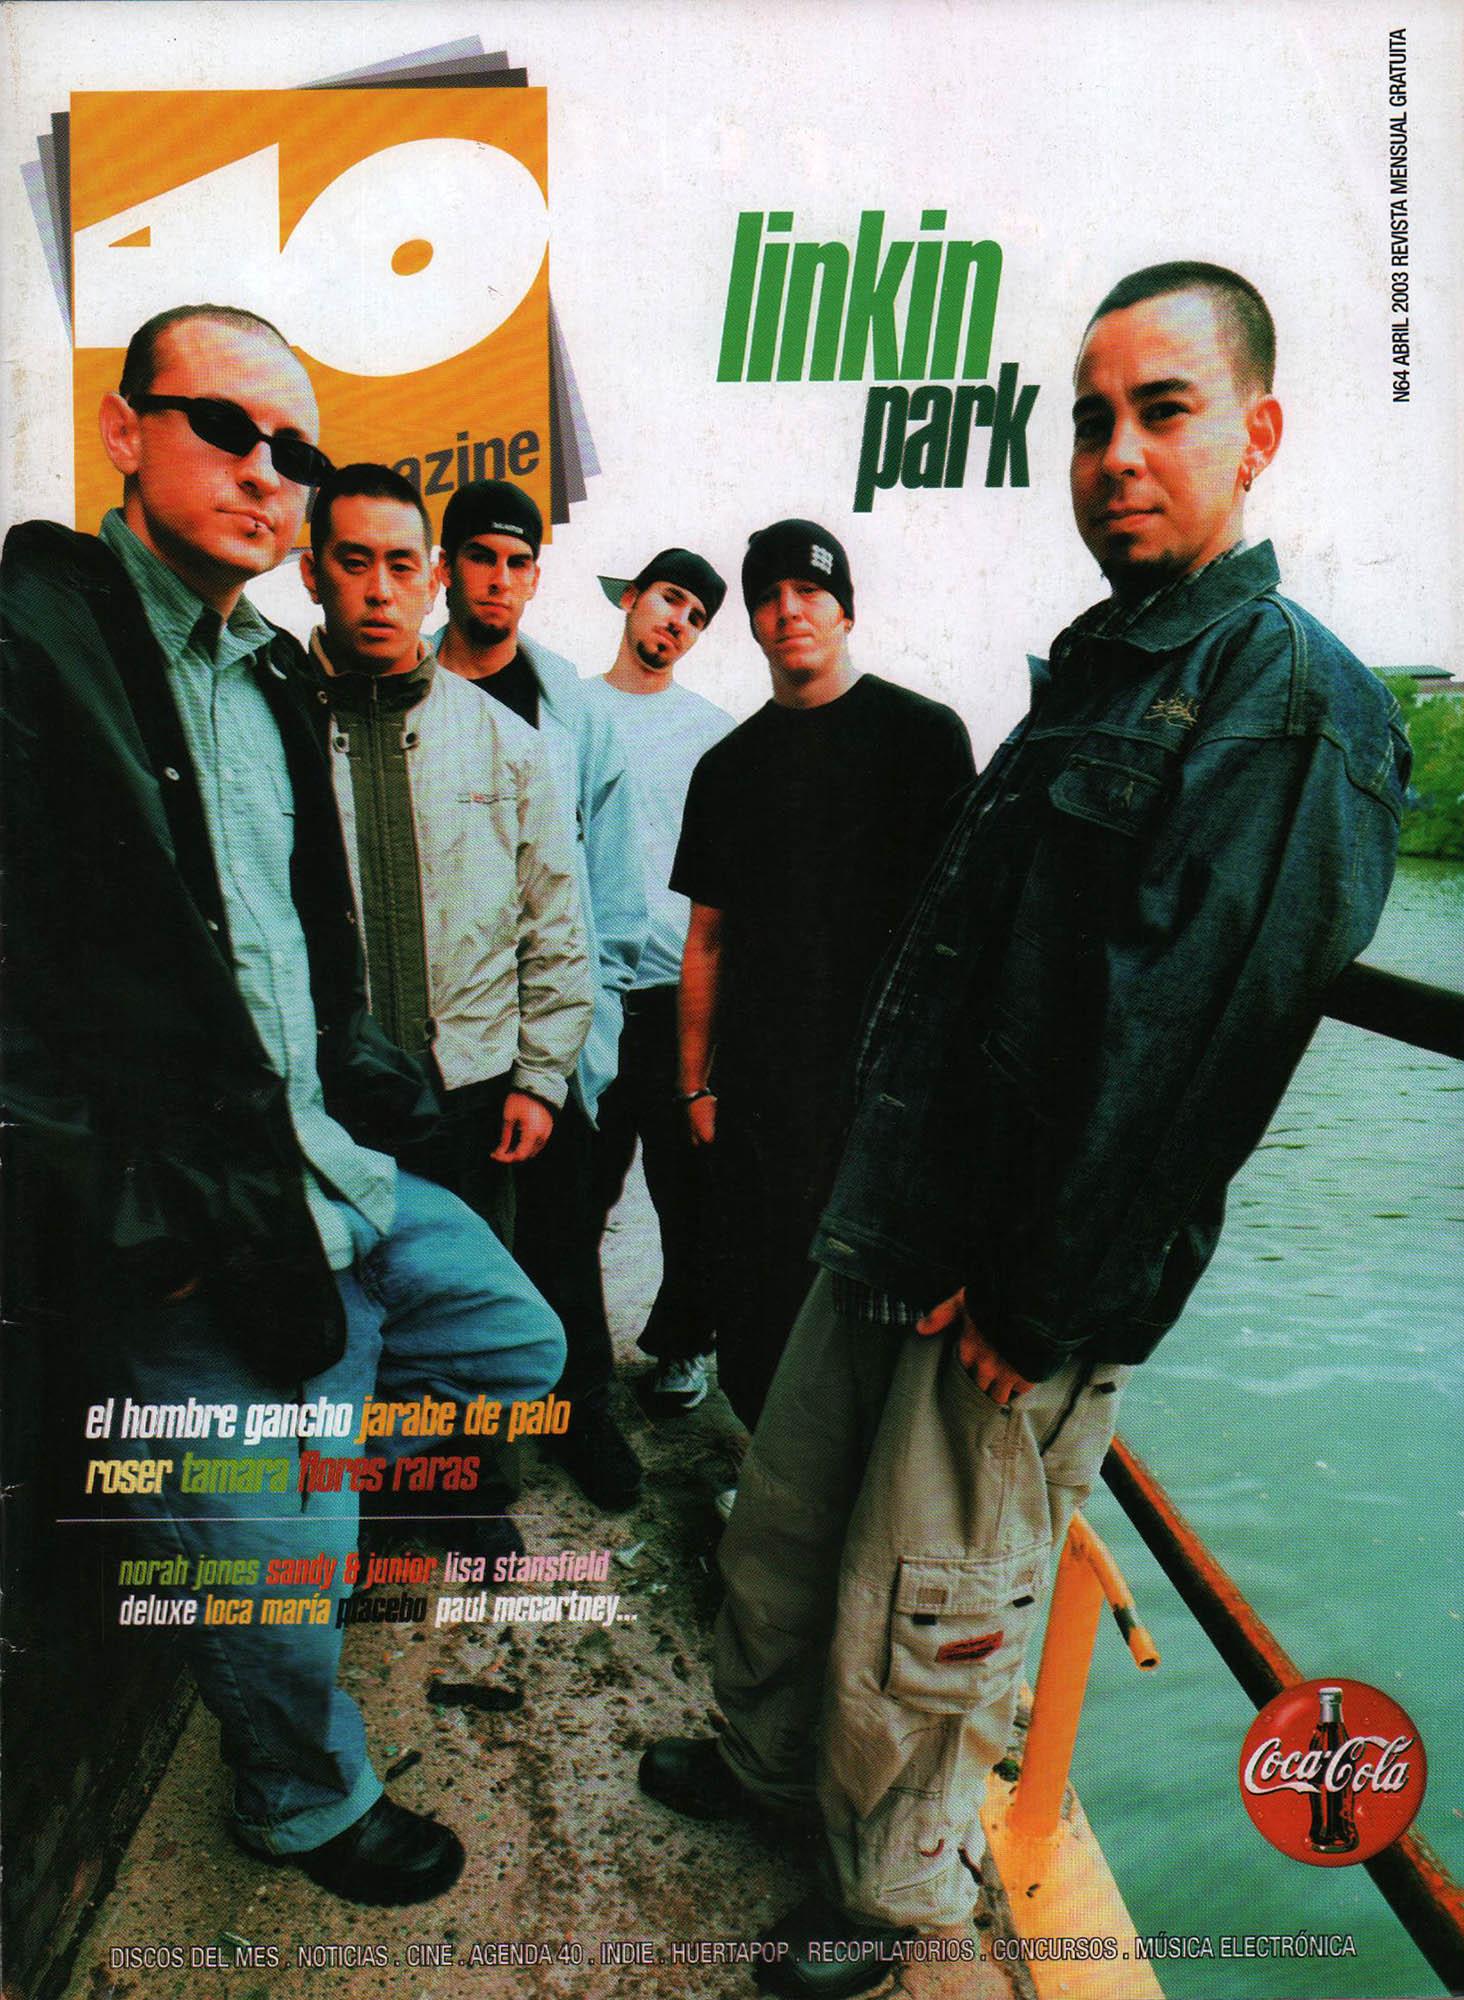 Linkin Park | 40 Magazine | abr 2003